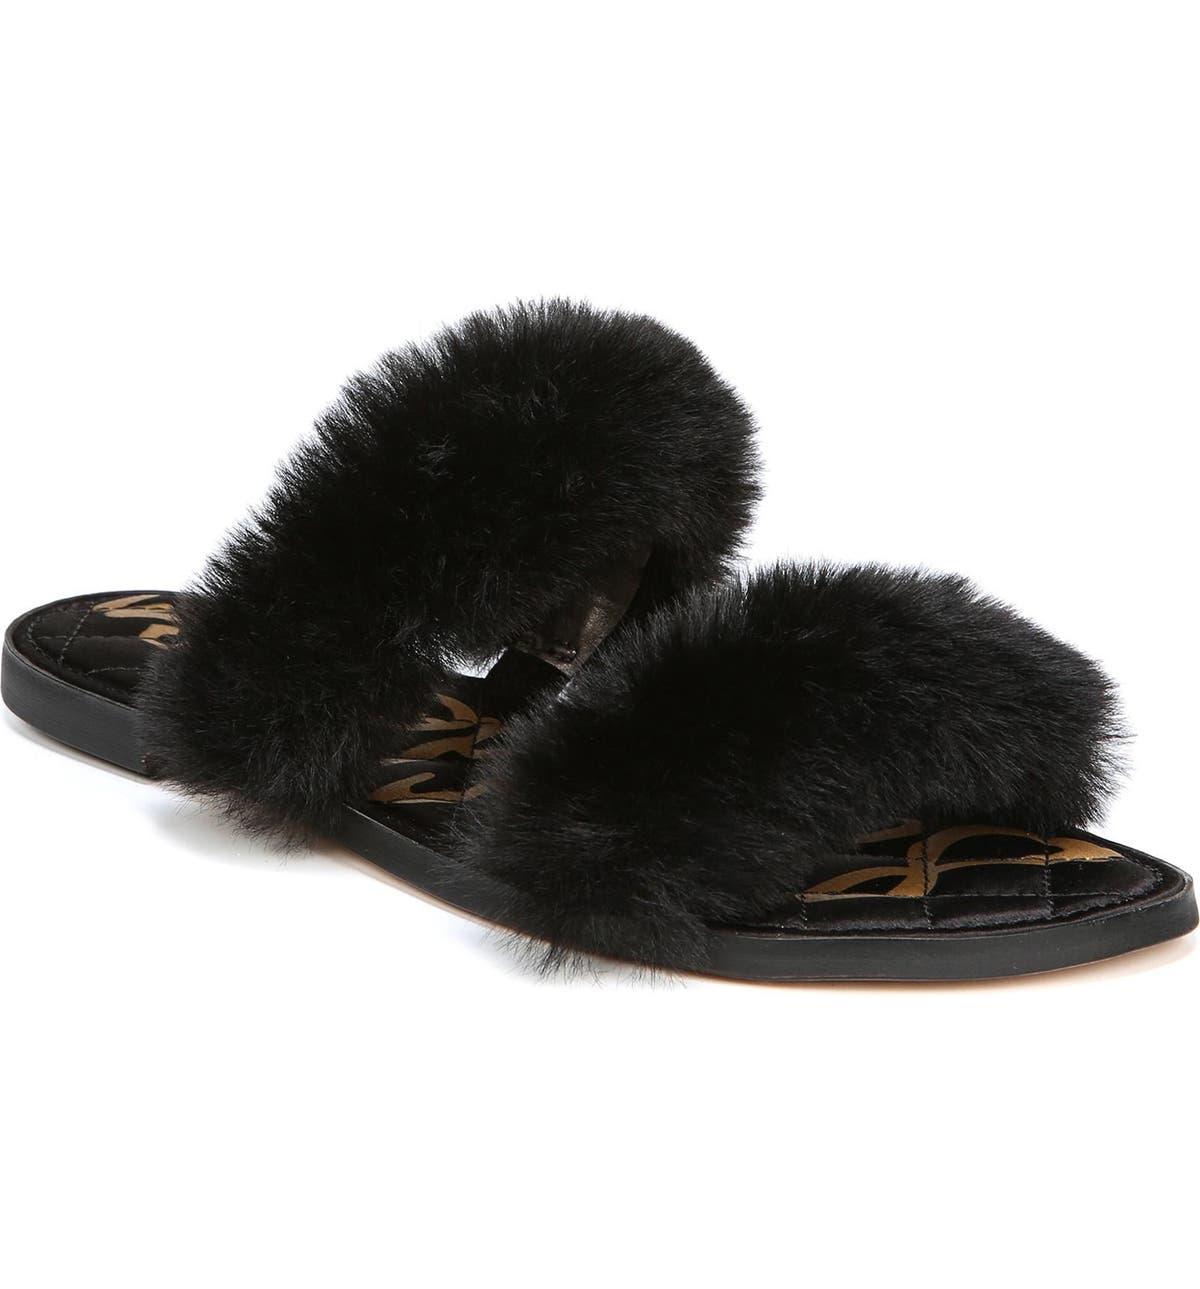 65a35a876d65 Sam Edelman Griselda Faux Fur Slide Sandal (Women)